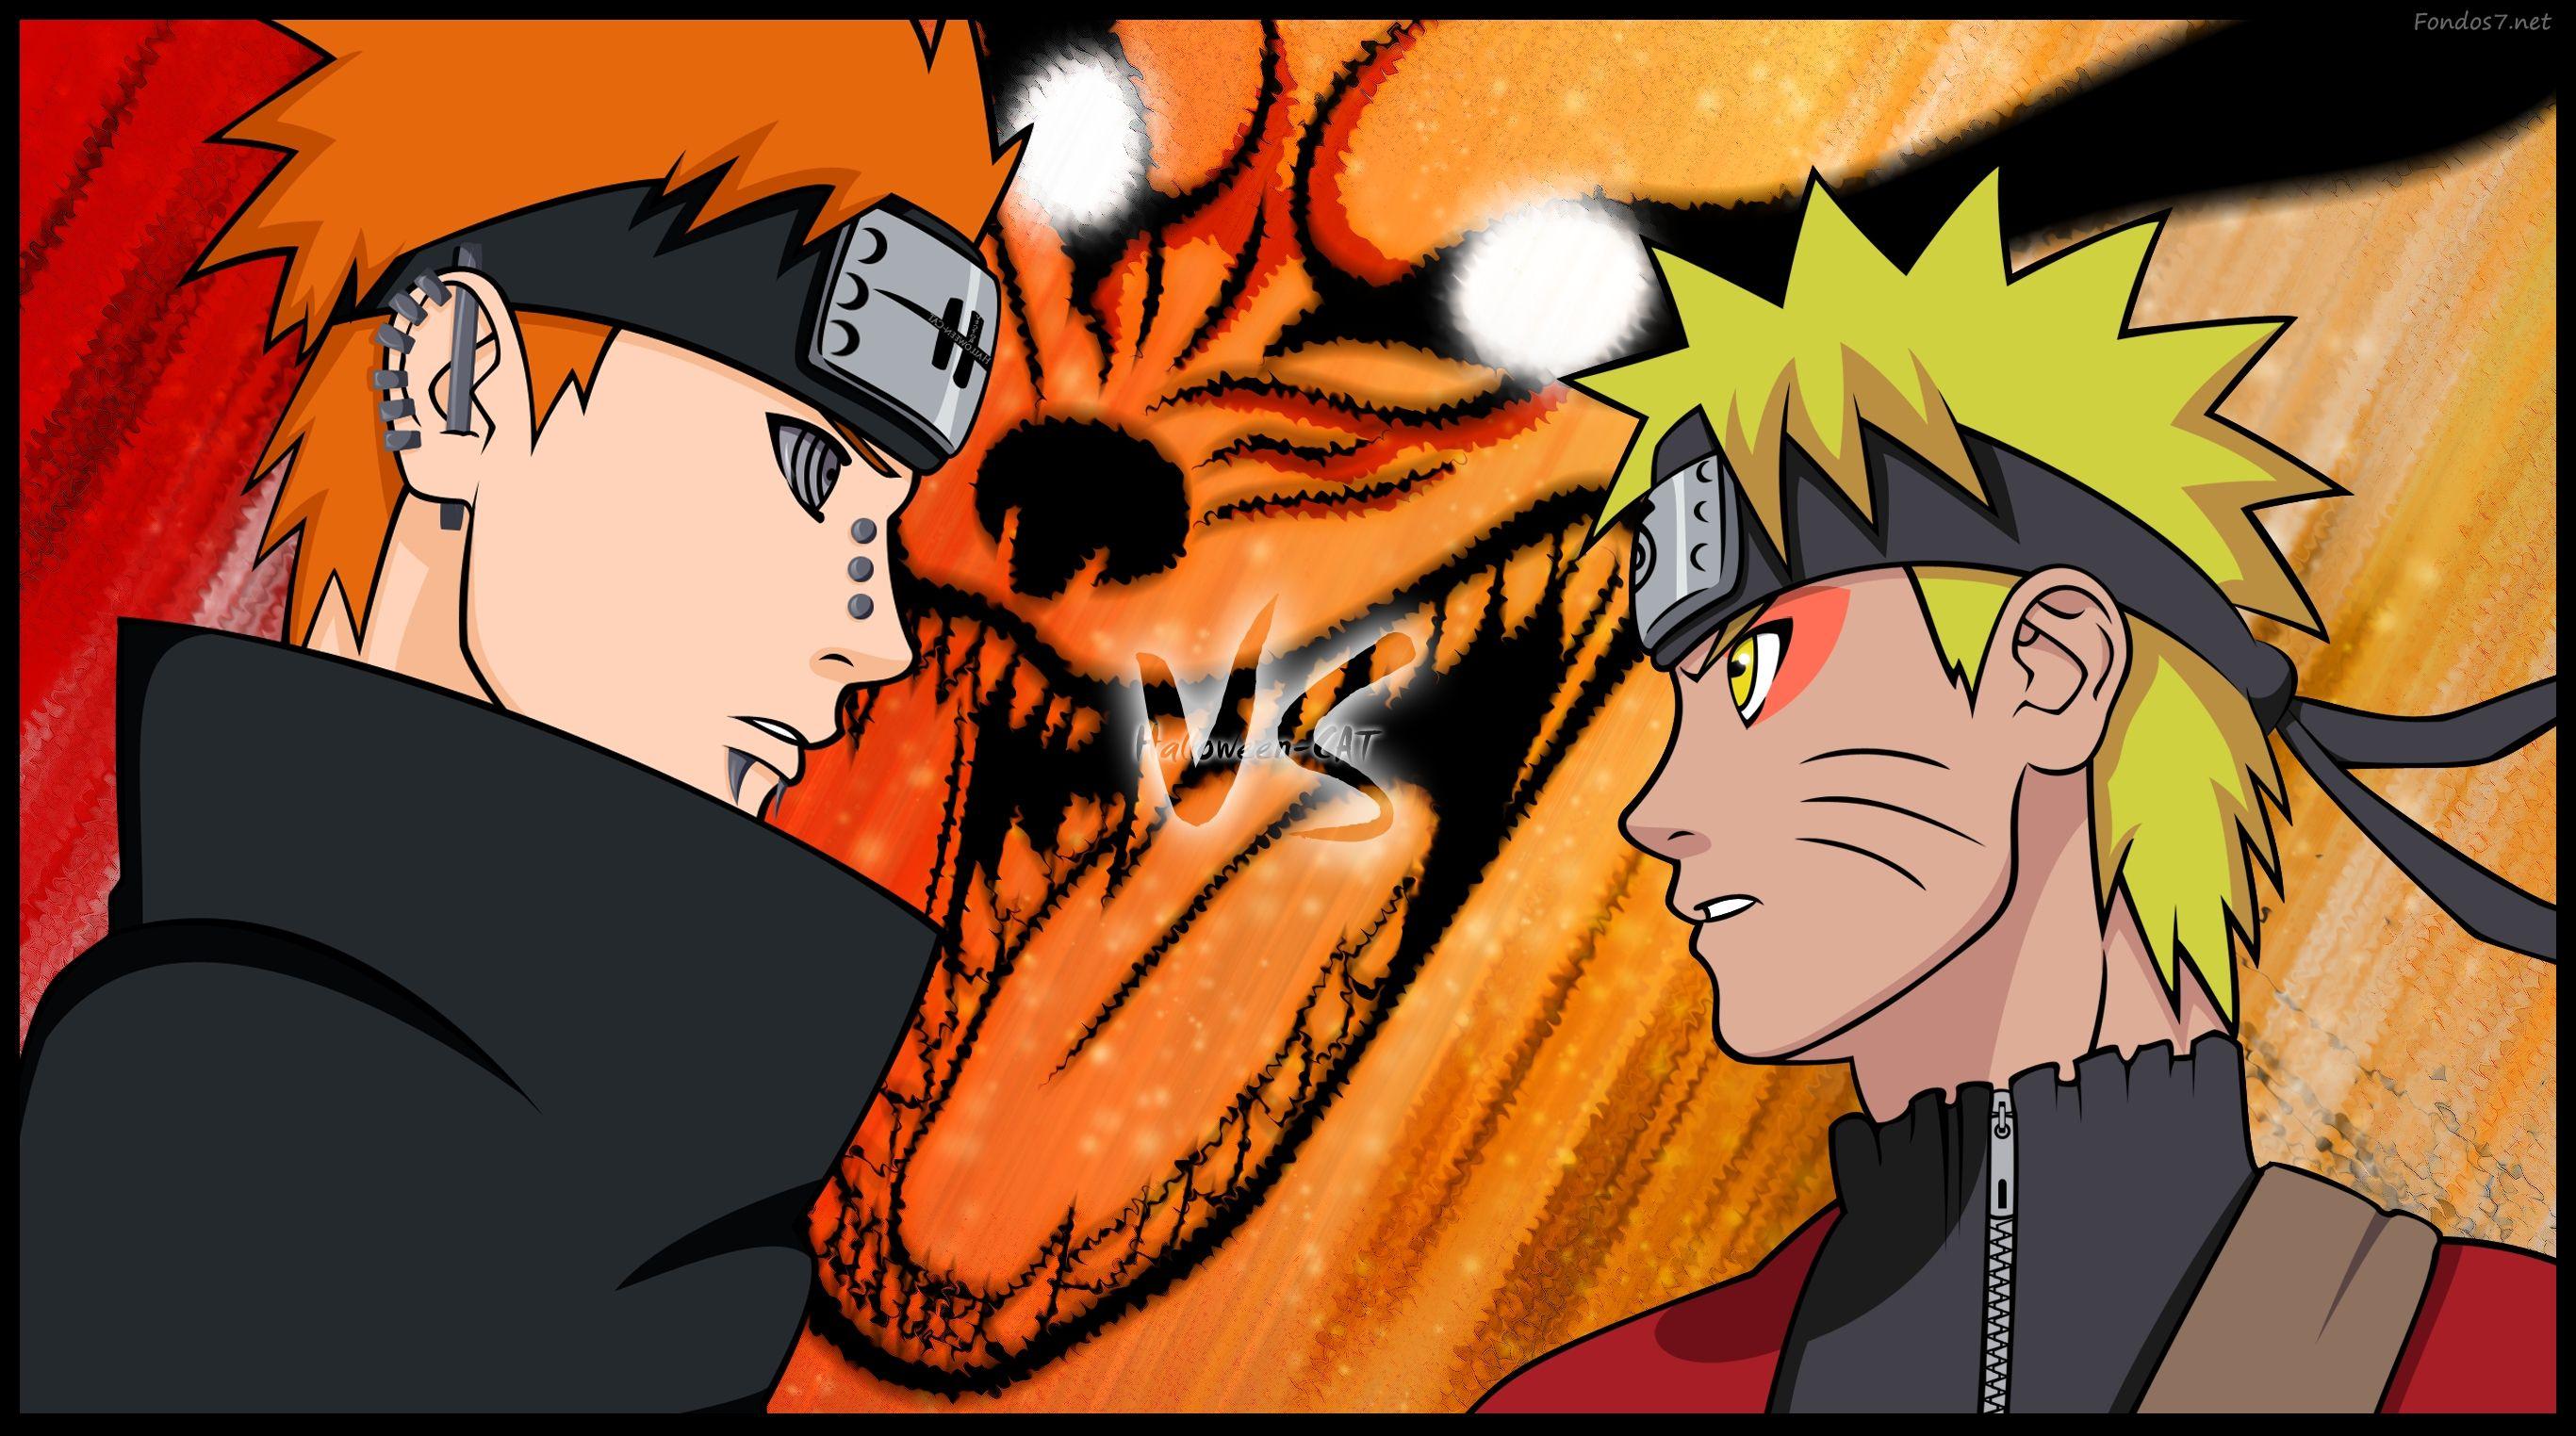 Unduh 85+ Wallpaper Naruto Gratis Gratis Terbaru